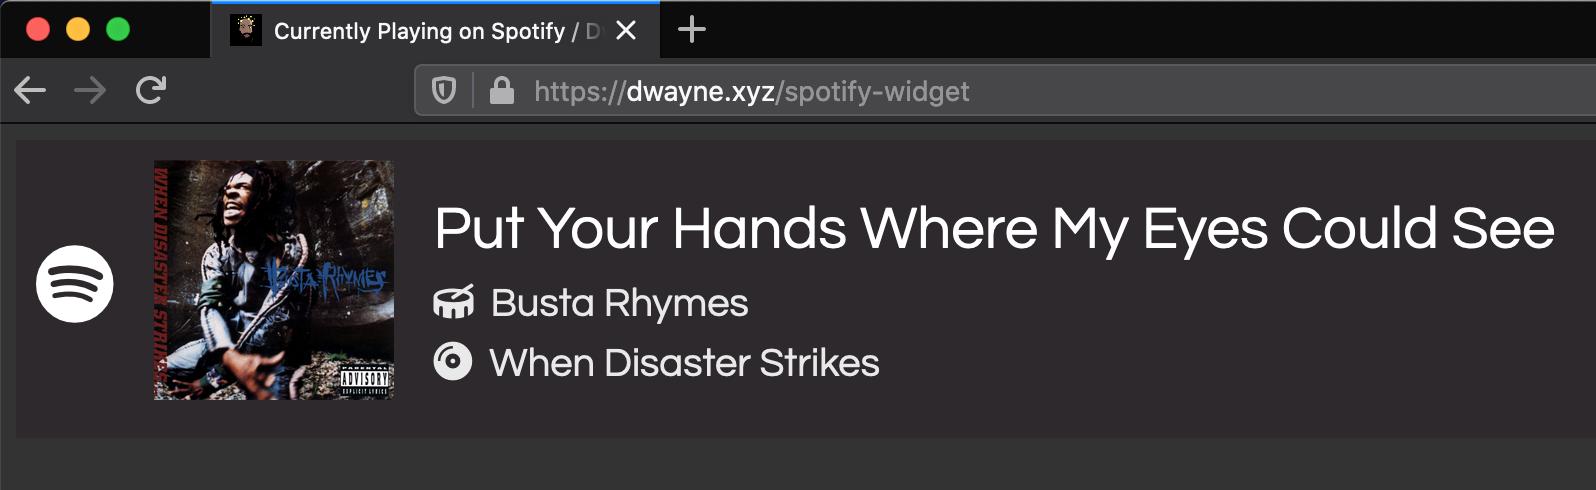 Screenshot of my spotify widget page